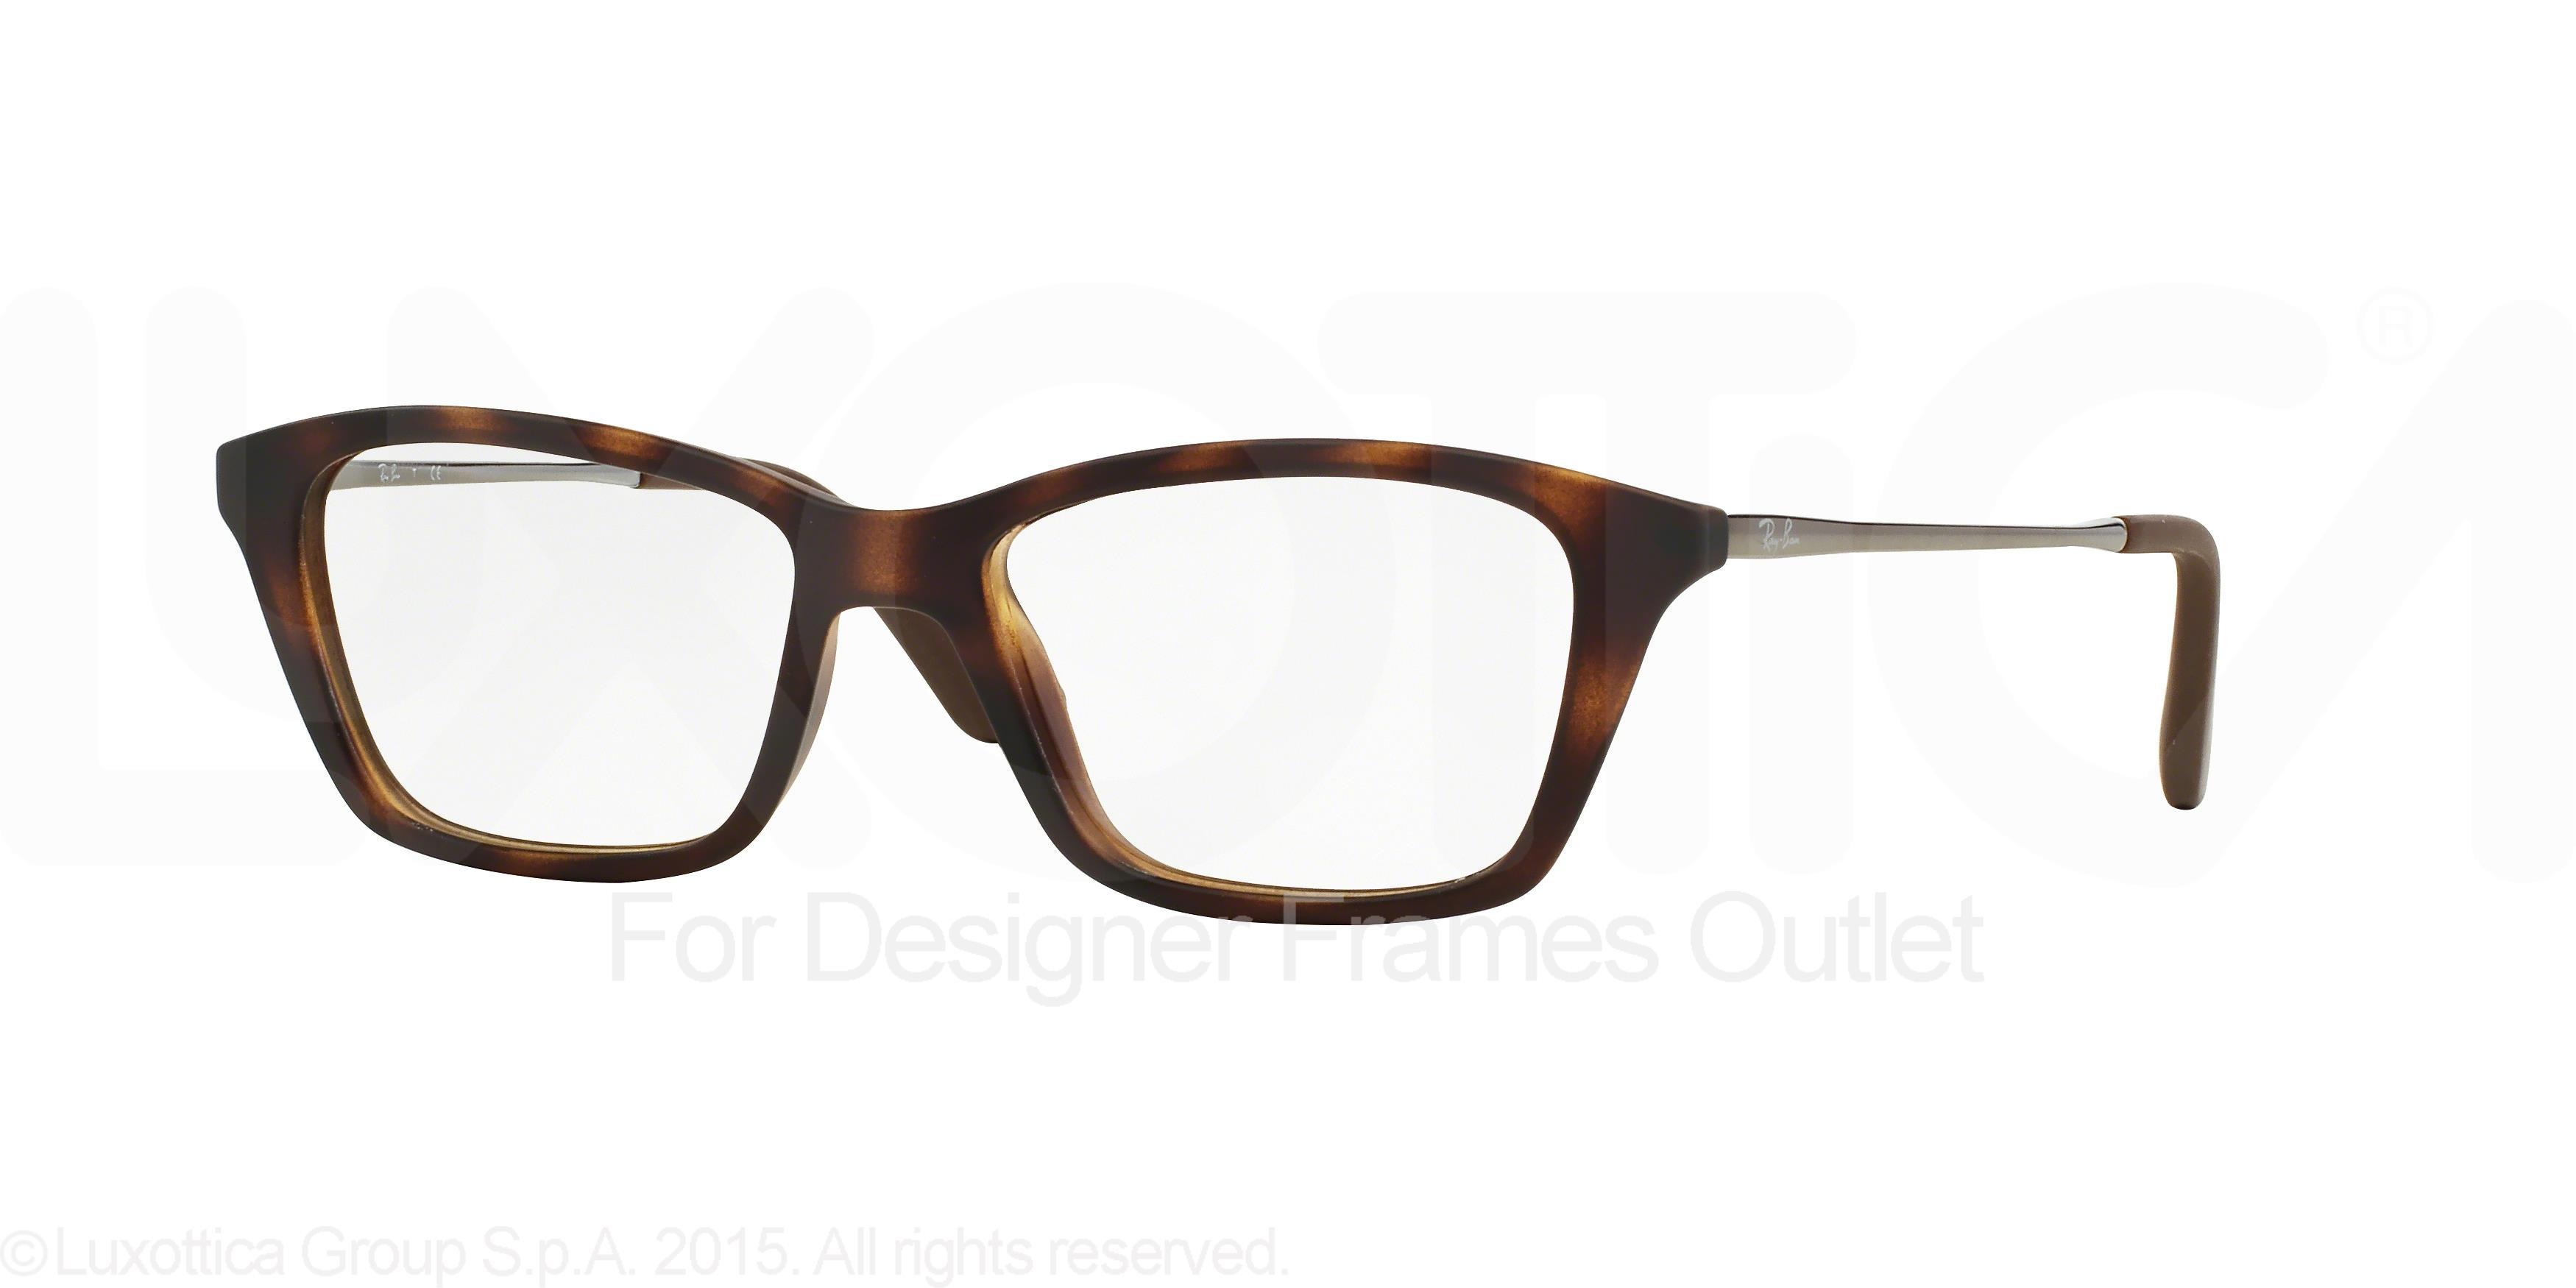 4fae947238 Eyeglasses